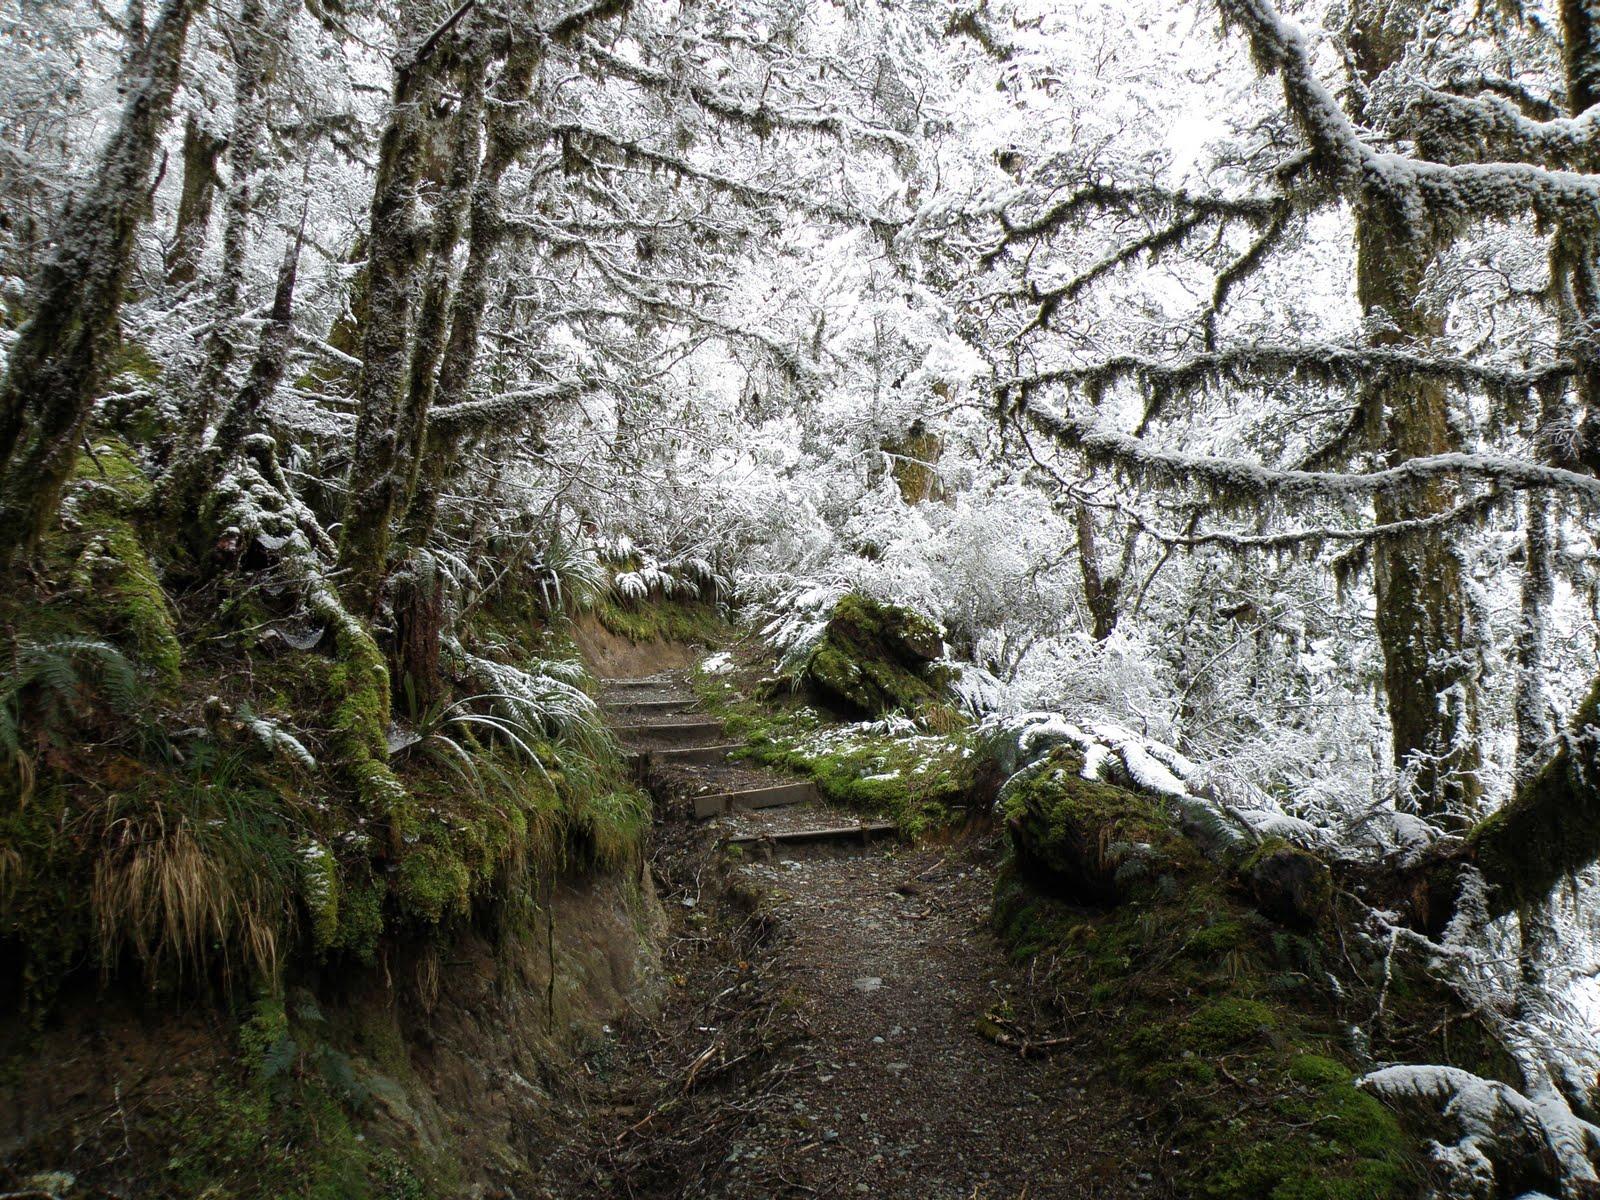 Trail Running Wallpaper From richard trail running in 1600x1200